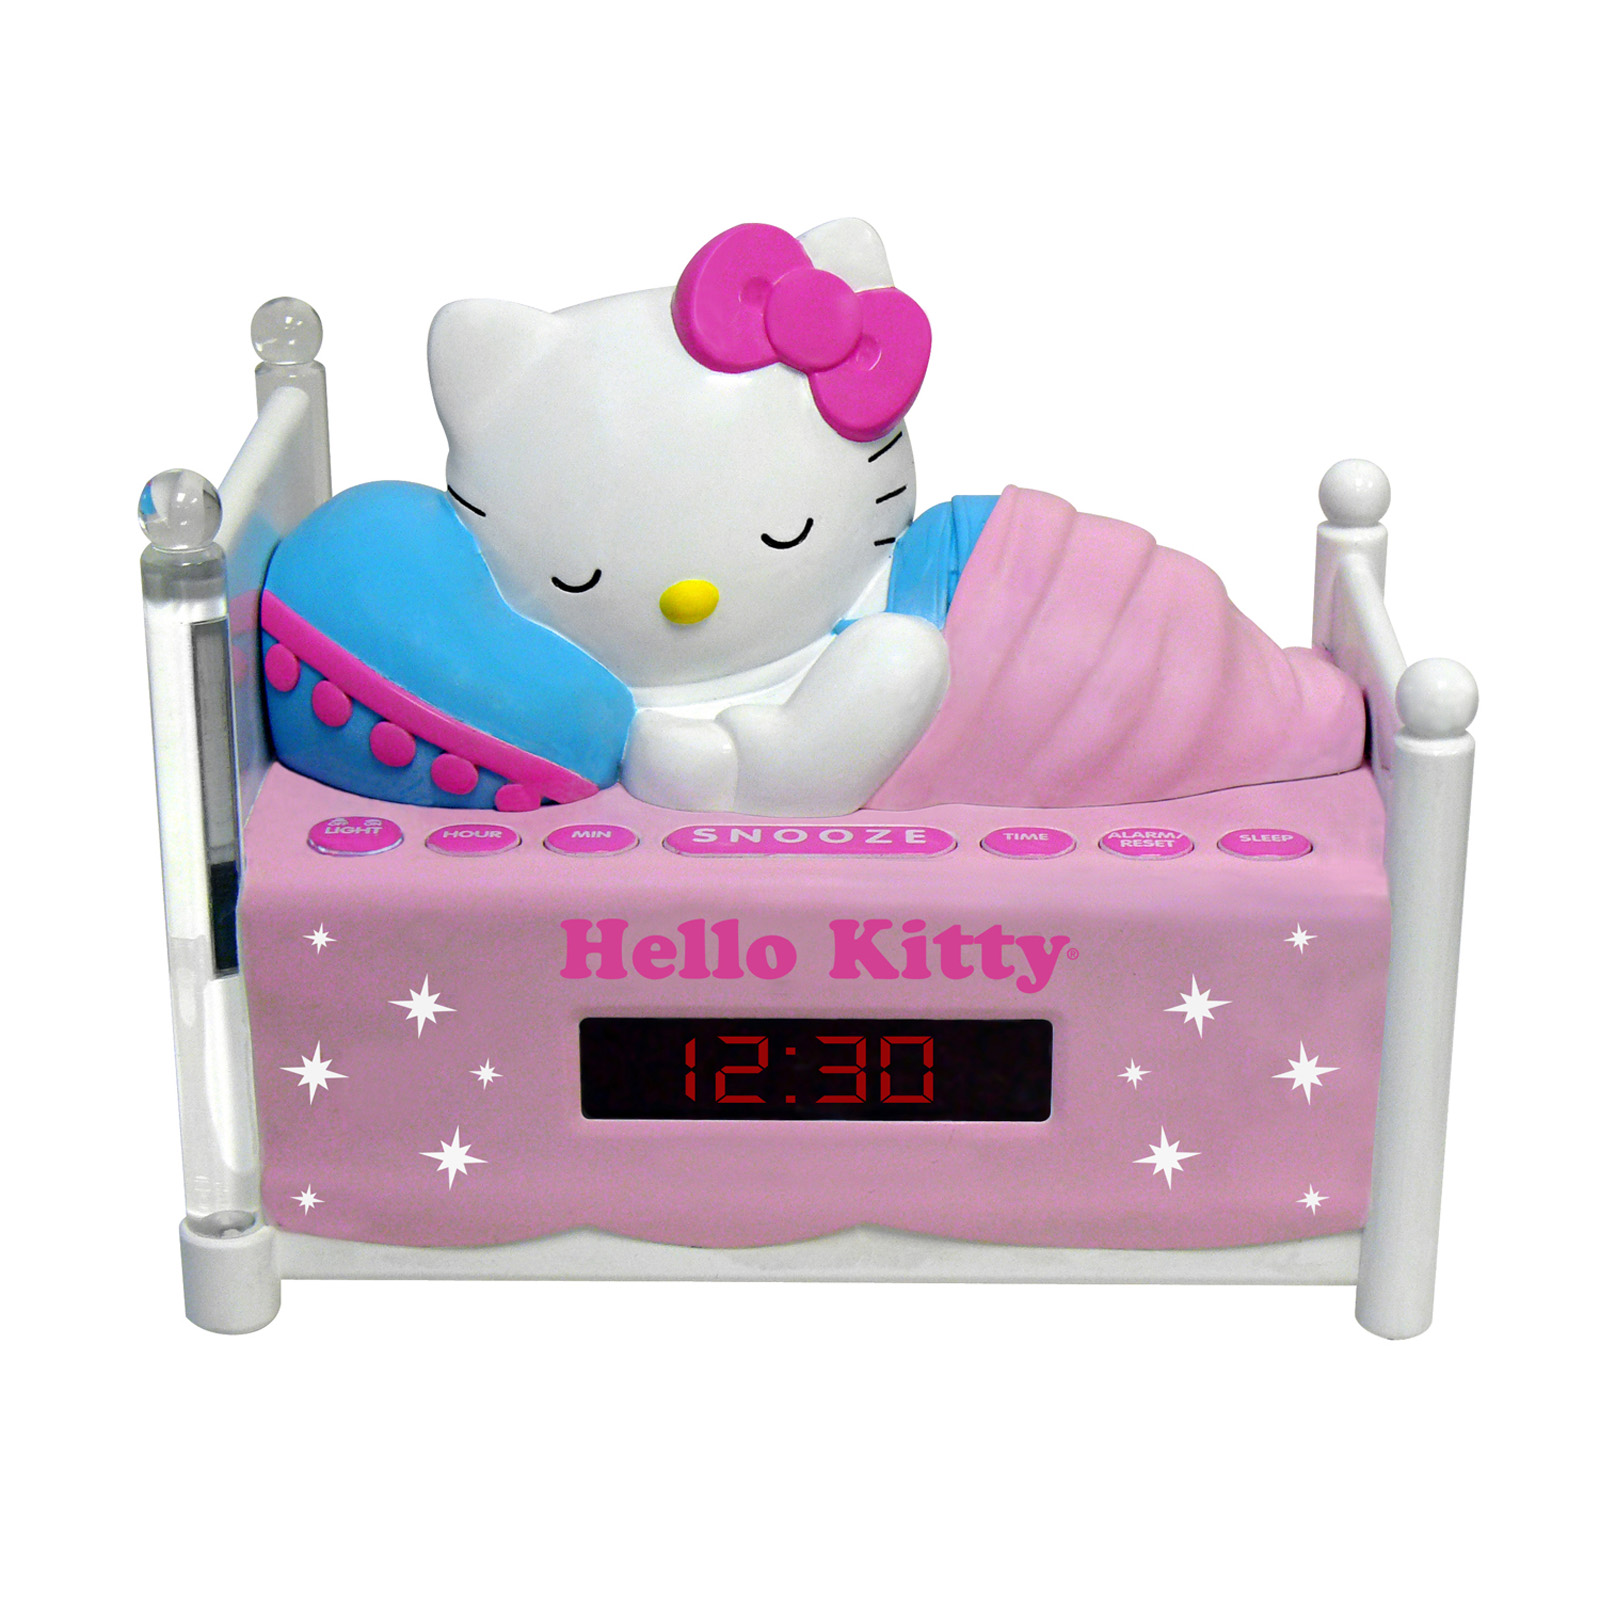 Hello Kitty Sleeping Kitty Alarm Clock Radio with Night Light by Hello Kitty